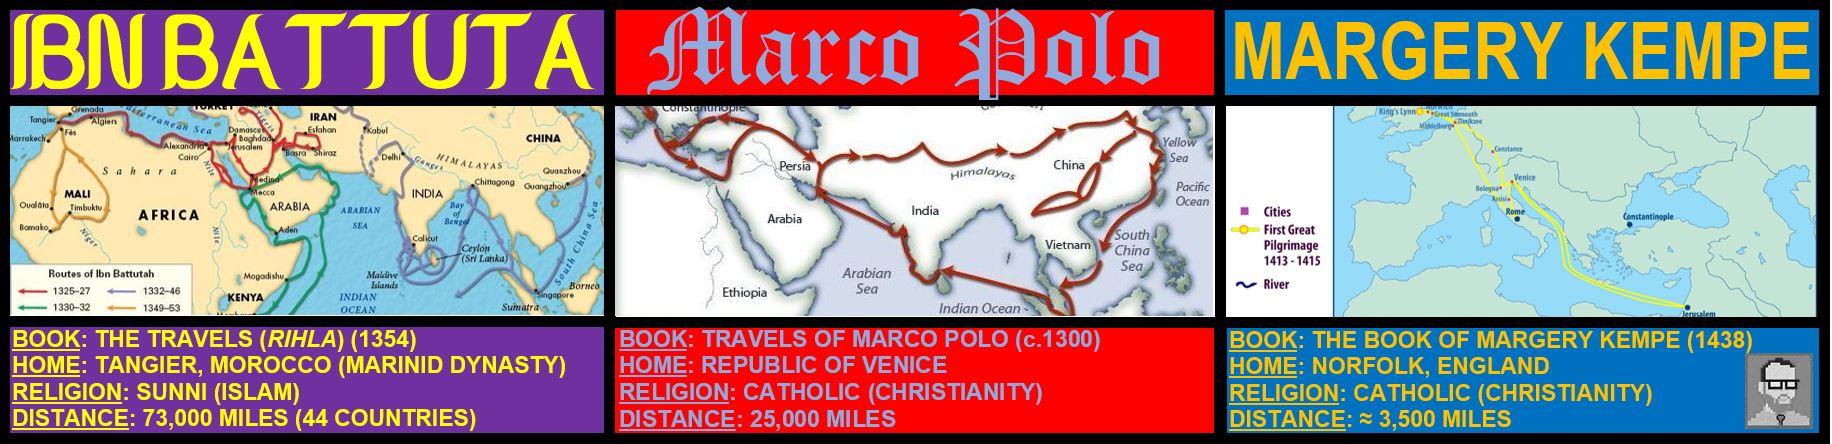 INCREASING NUMBER OF TRAVELERS WITHIN AFRO EURASIA BATTUTA POLO KEMPE AP WORLD MODERN FREEMANPEDIA.JPG